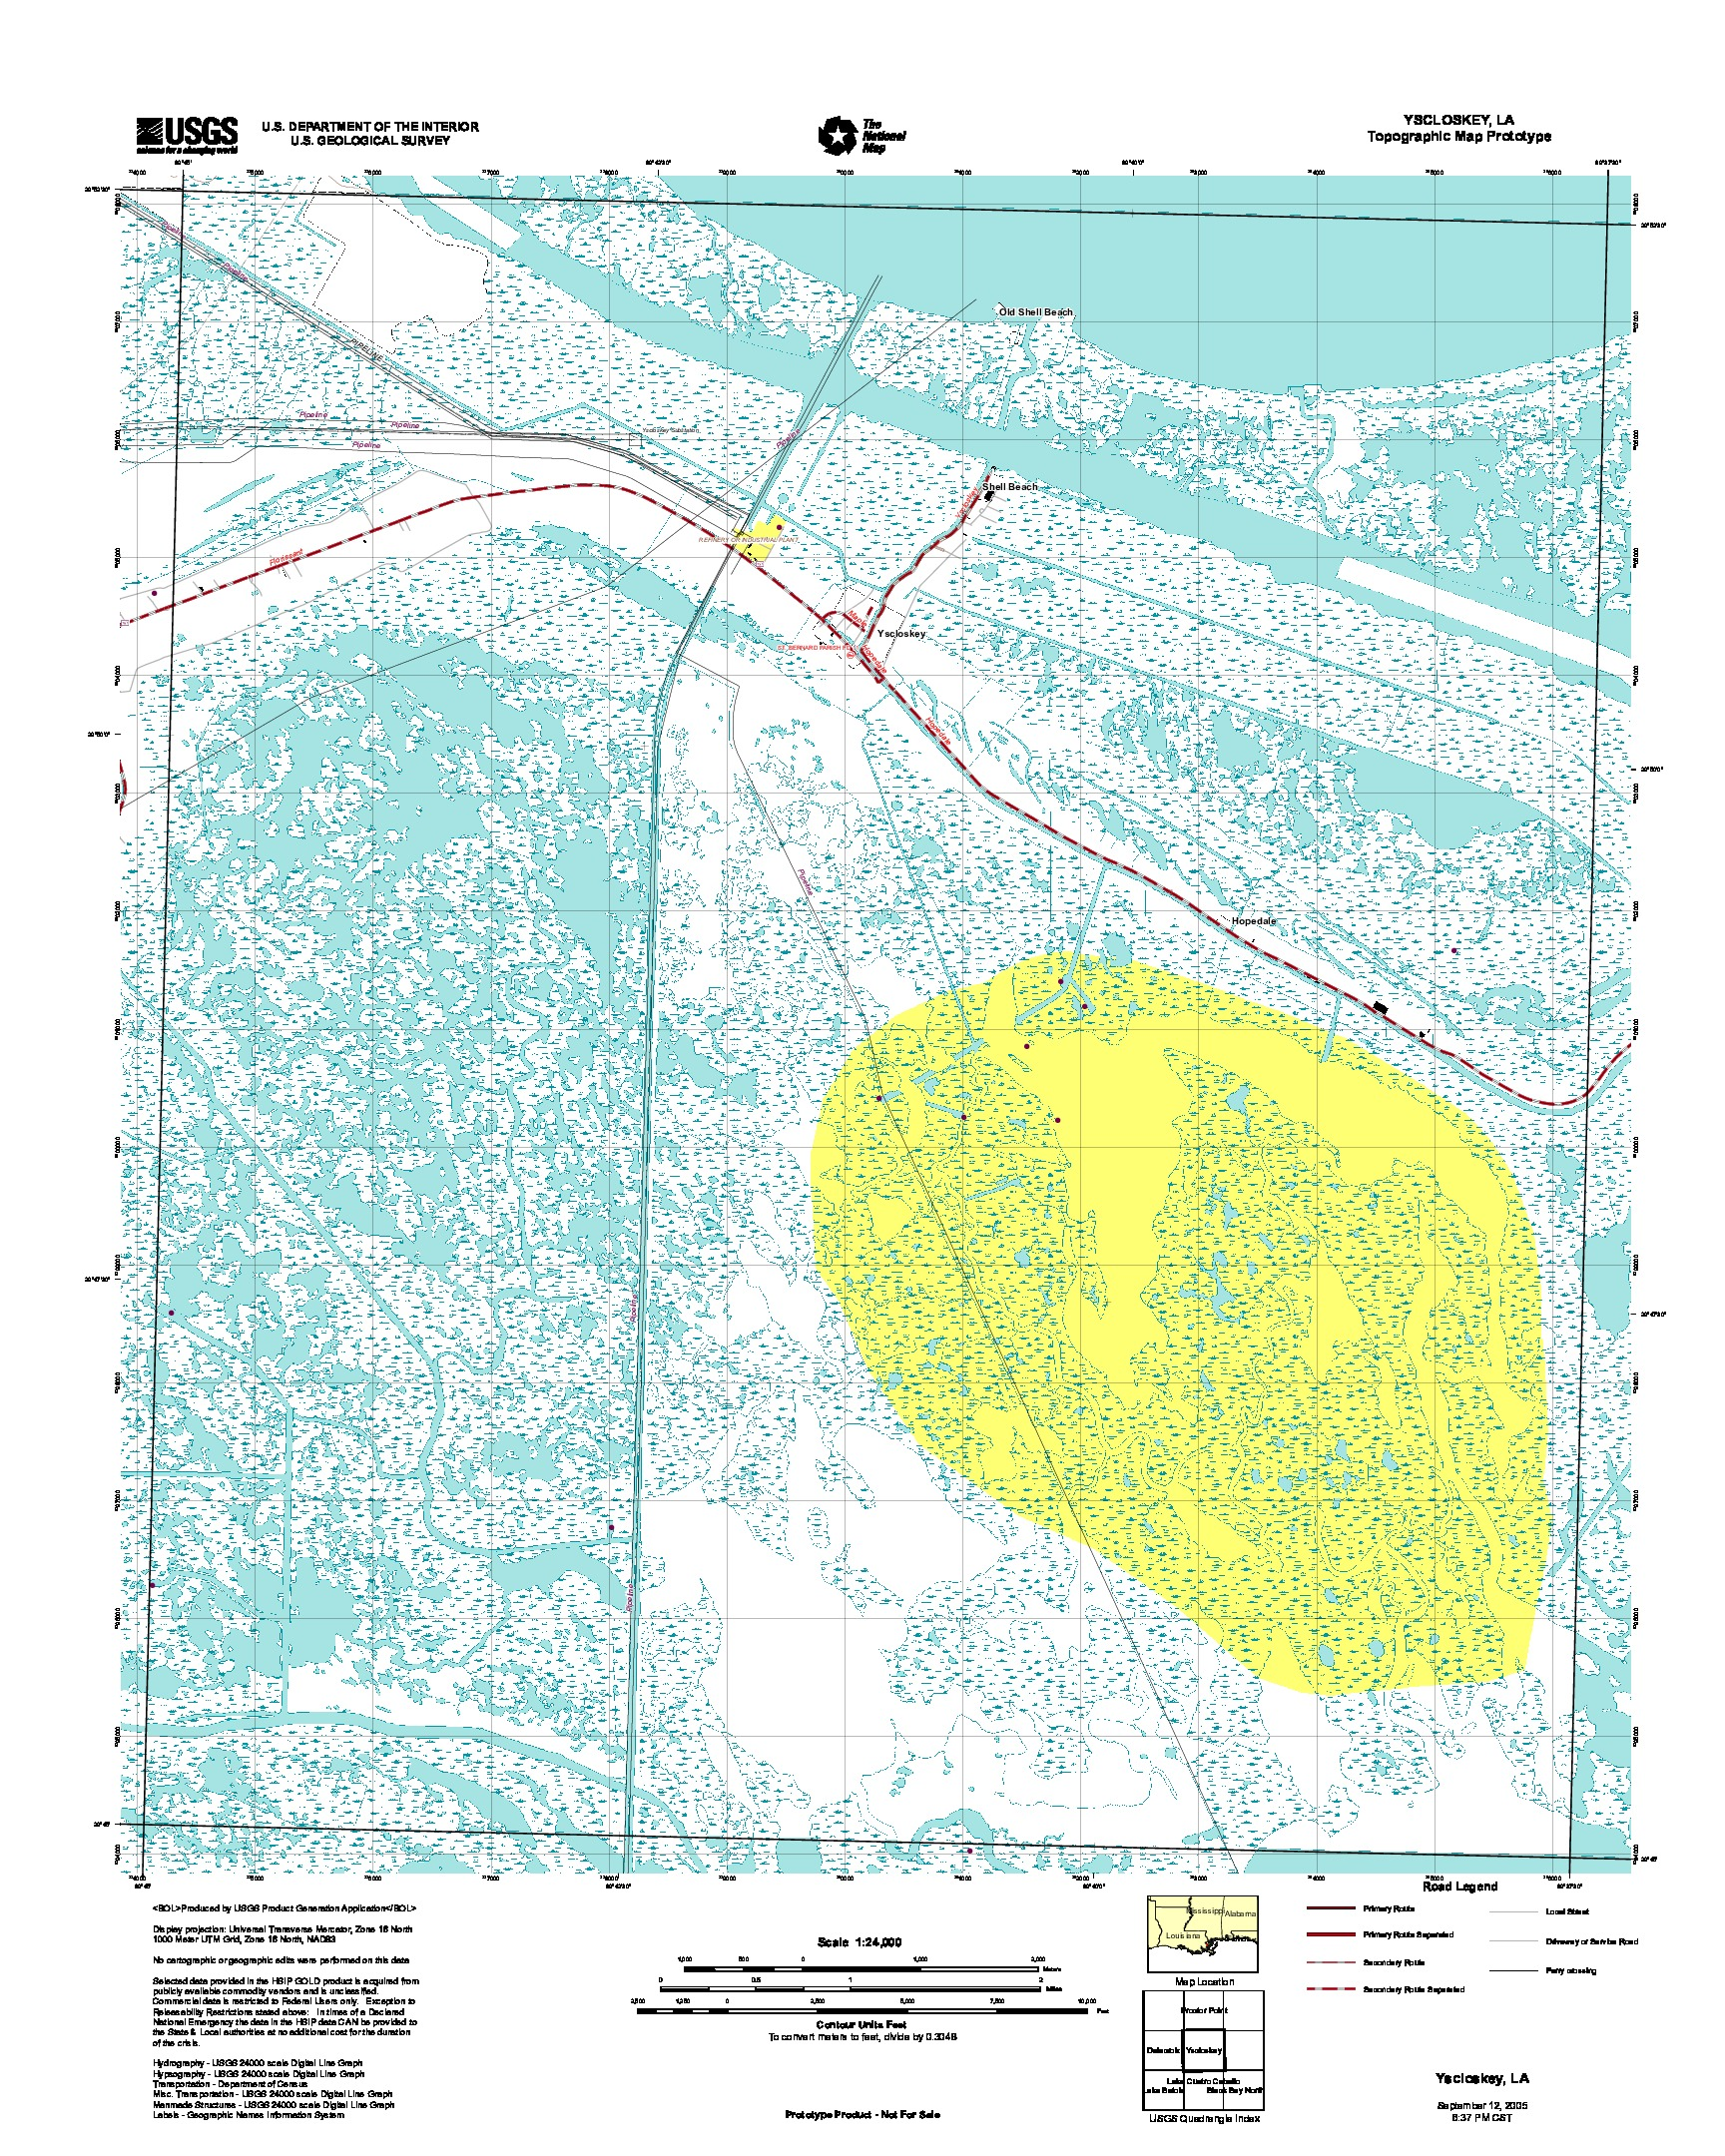 Yscloskey, Topographic Map Prototype, Louisiana, United States, September 12, 2005